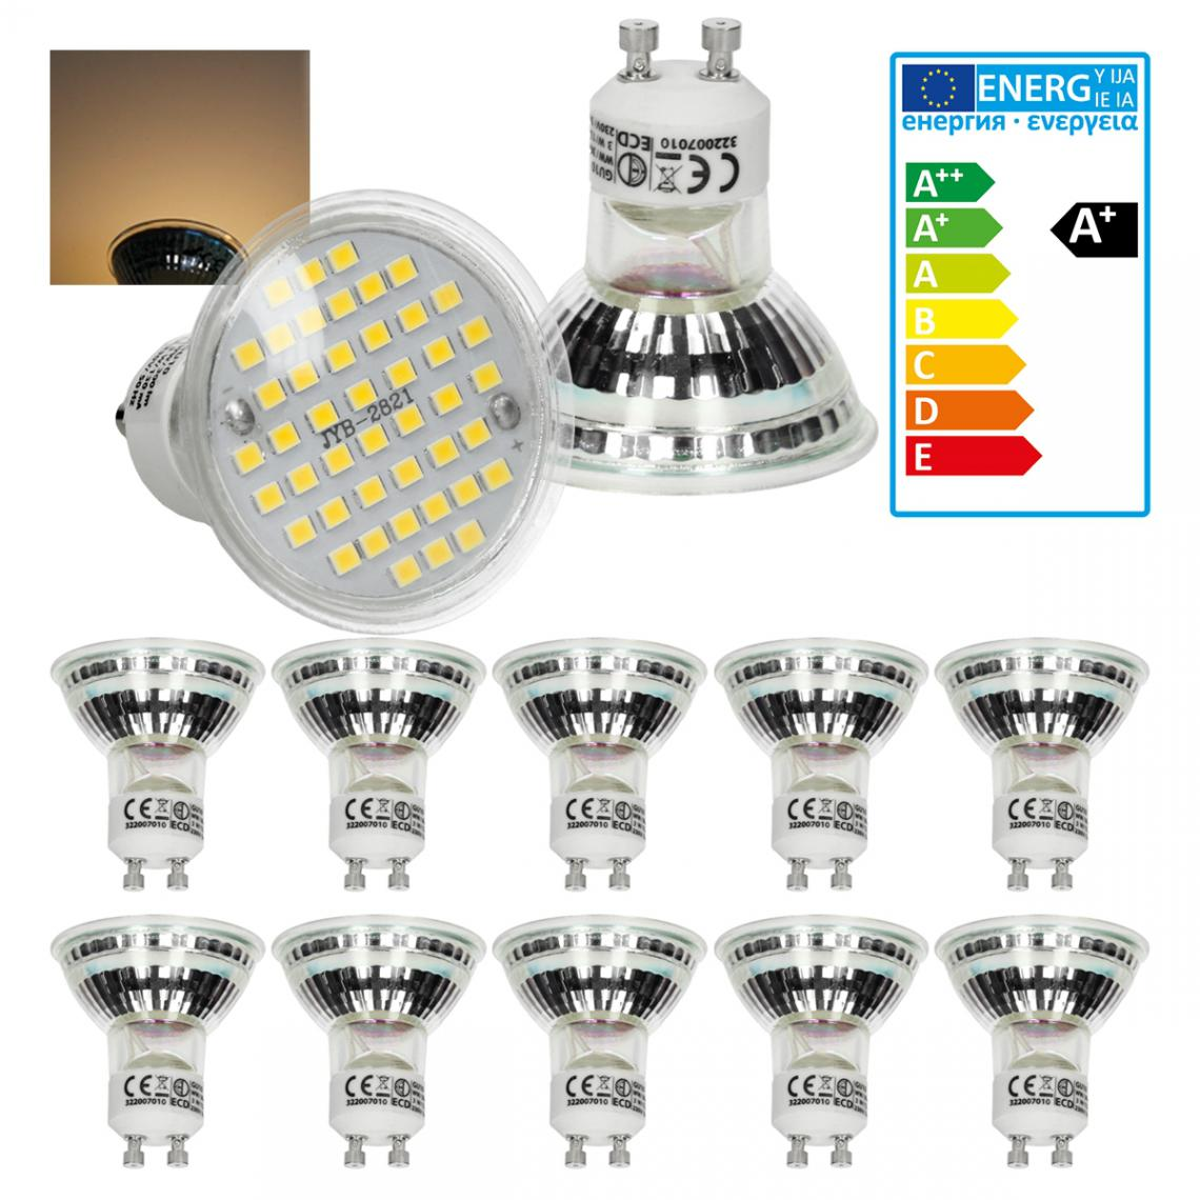 Ecd Germany ECD Germany 10 x LED GU10 44SMD Spot 3W - Lampe à LED 20W - en verre - 251 lumens - Blanc chaud 3000K - Spot à encastrer